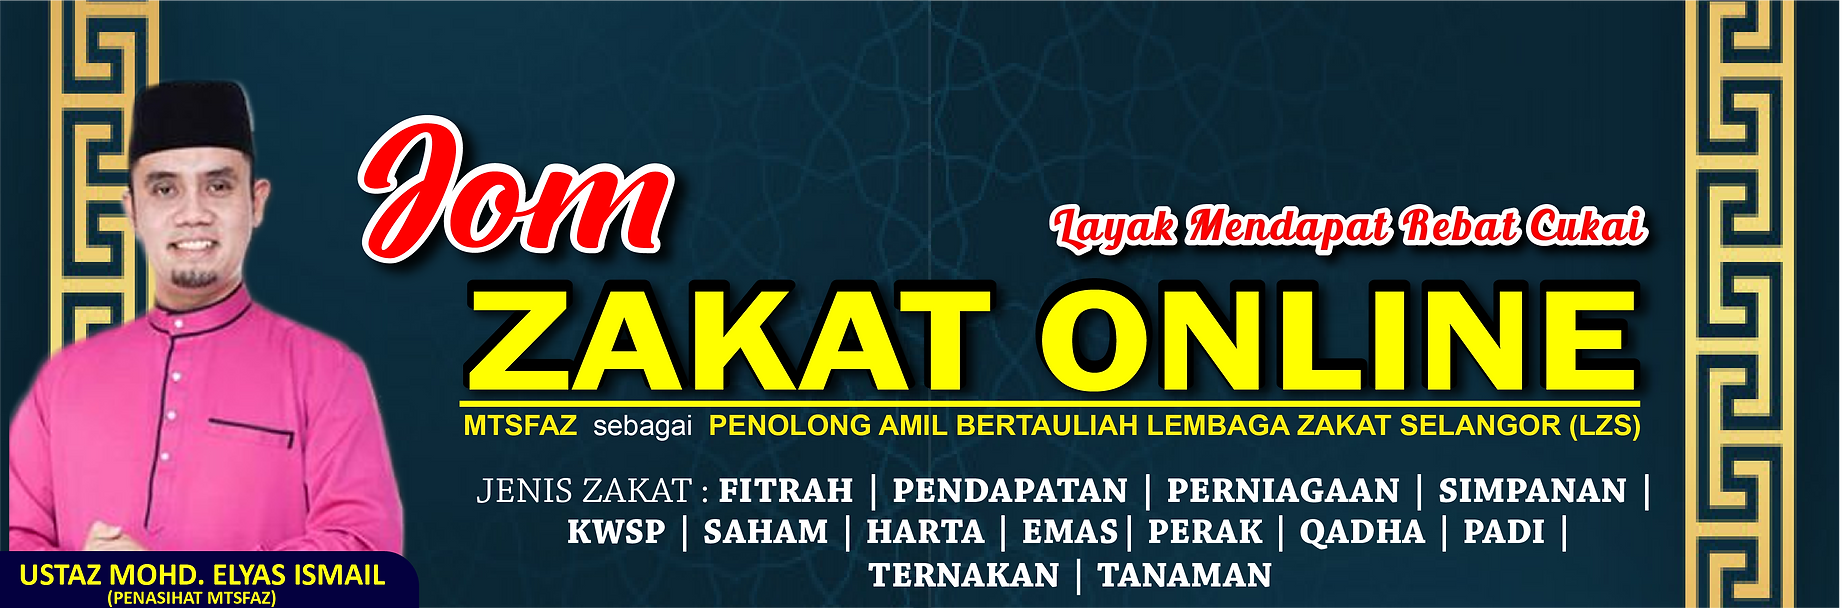 poster zakat banner header-03.png